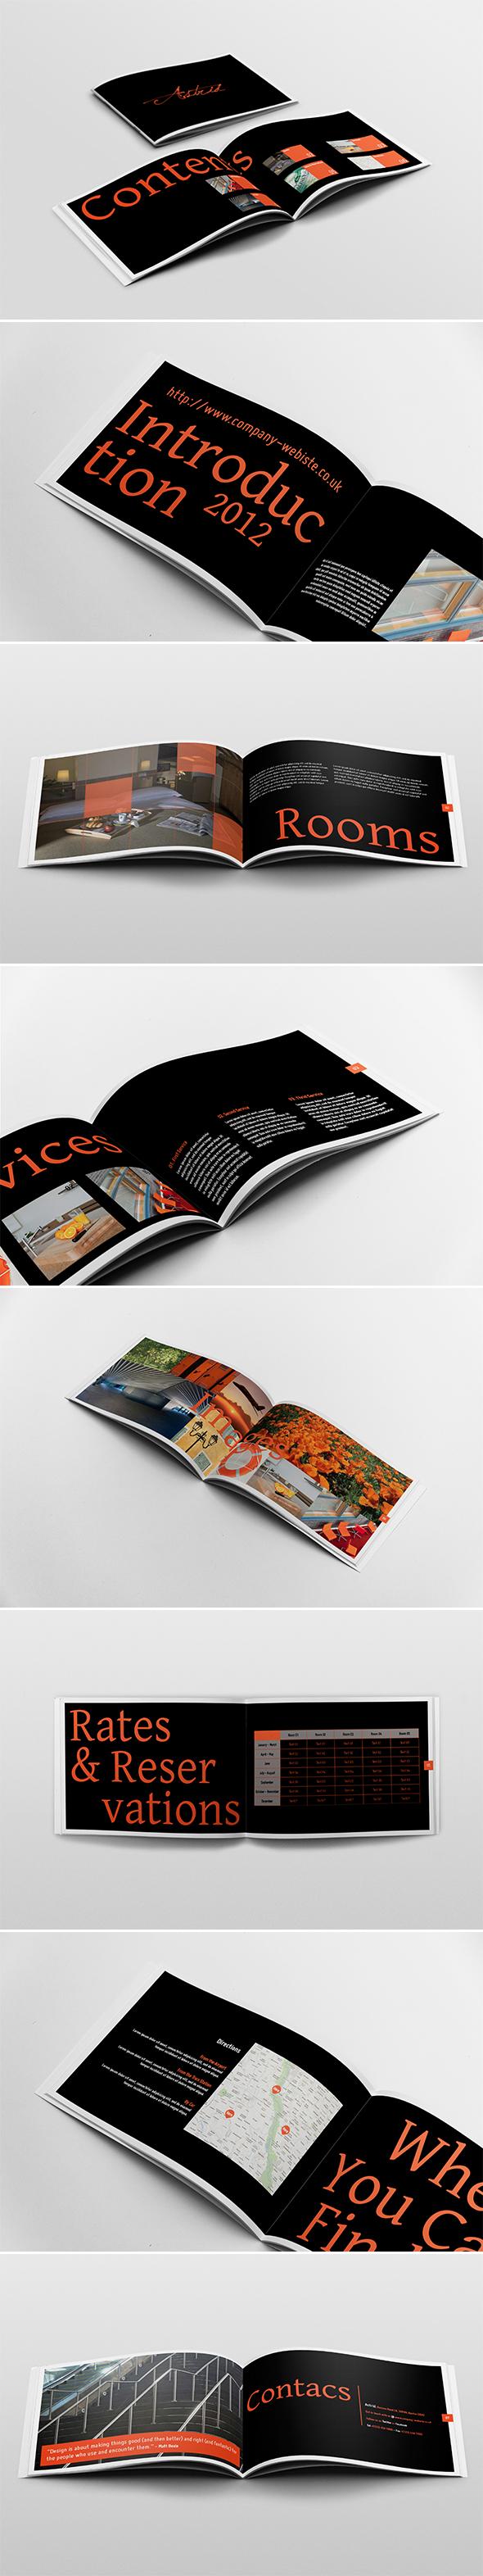 Horizontal Brochure